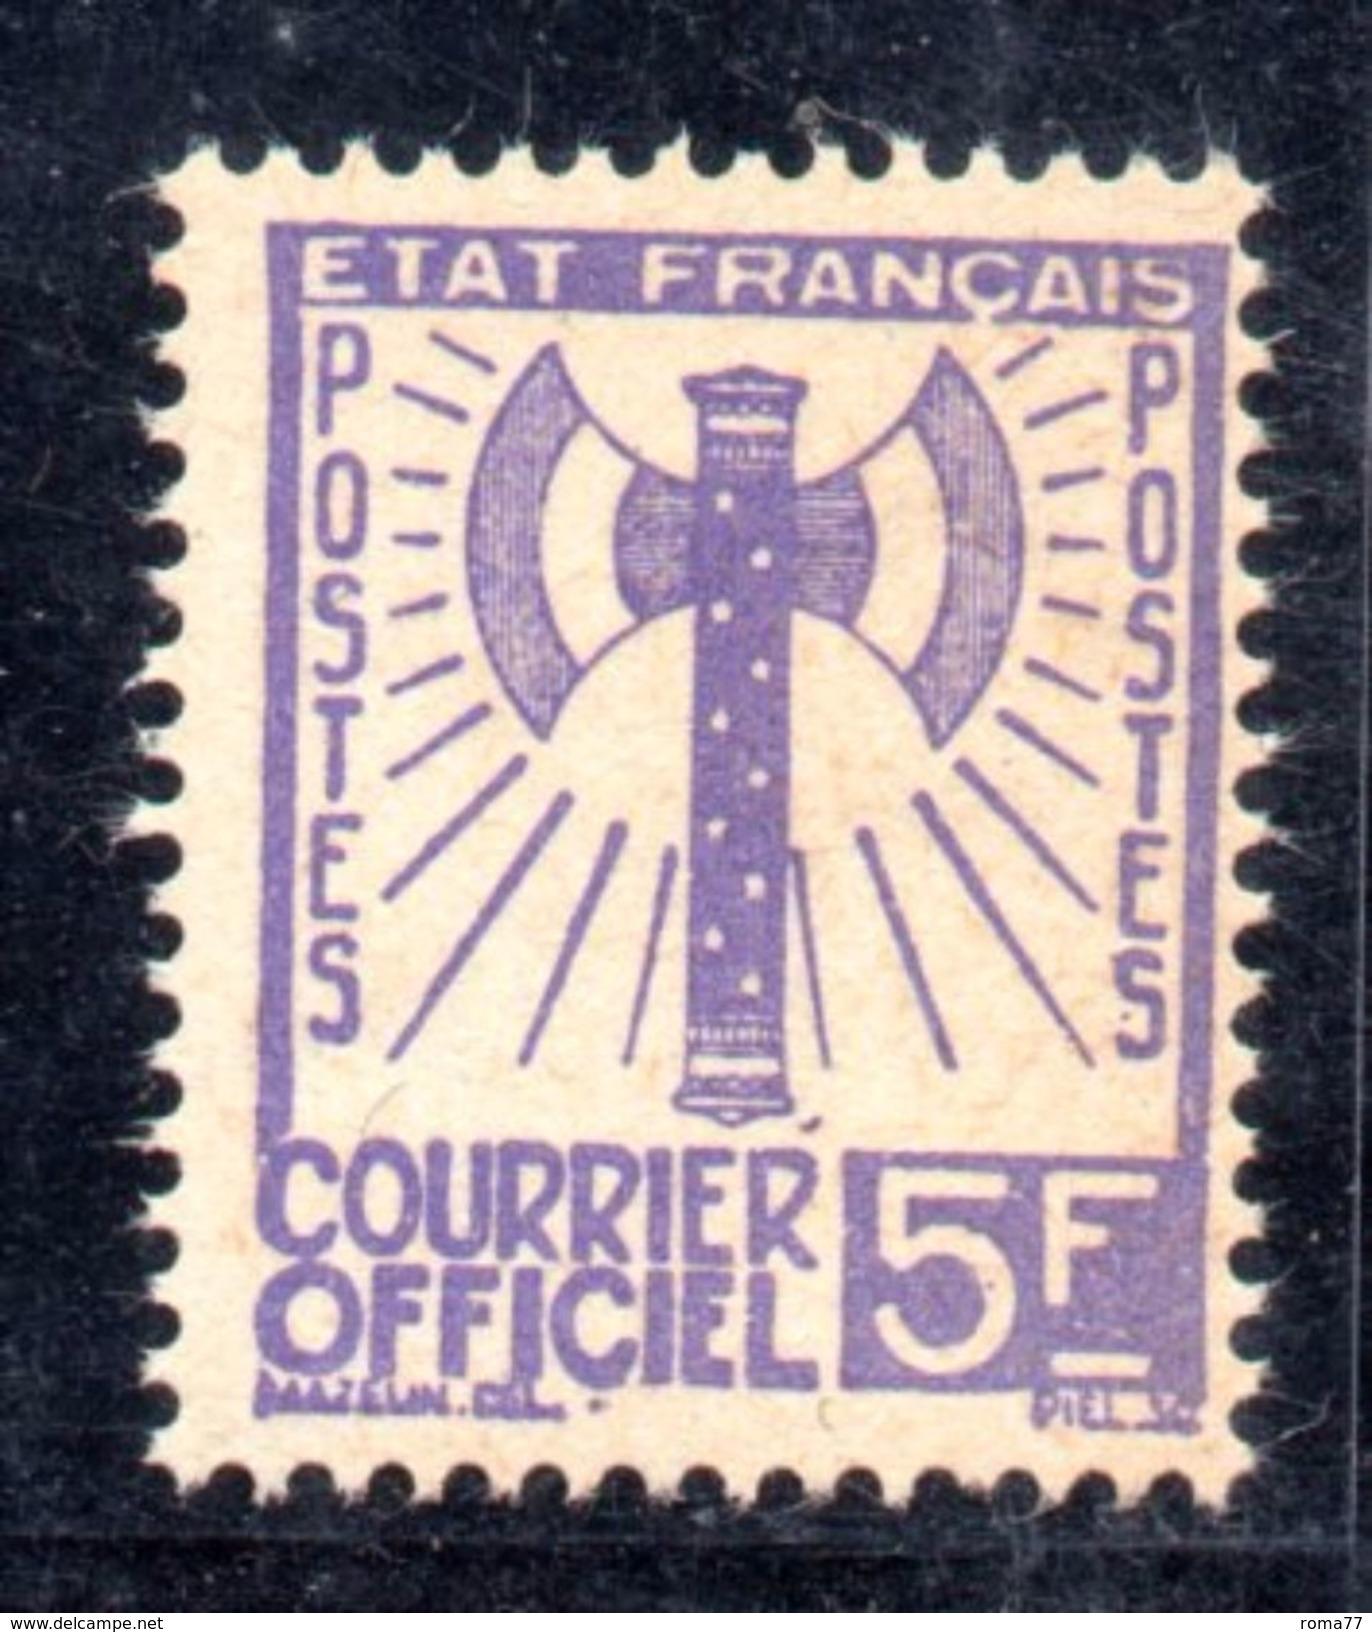 XP1583 - FRANCE Francia - 1943 - COURRIER OFFICIEL, Yvert  11 , 5 Franc *** MNH . - Servizio